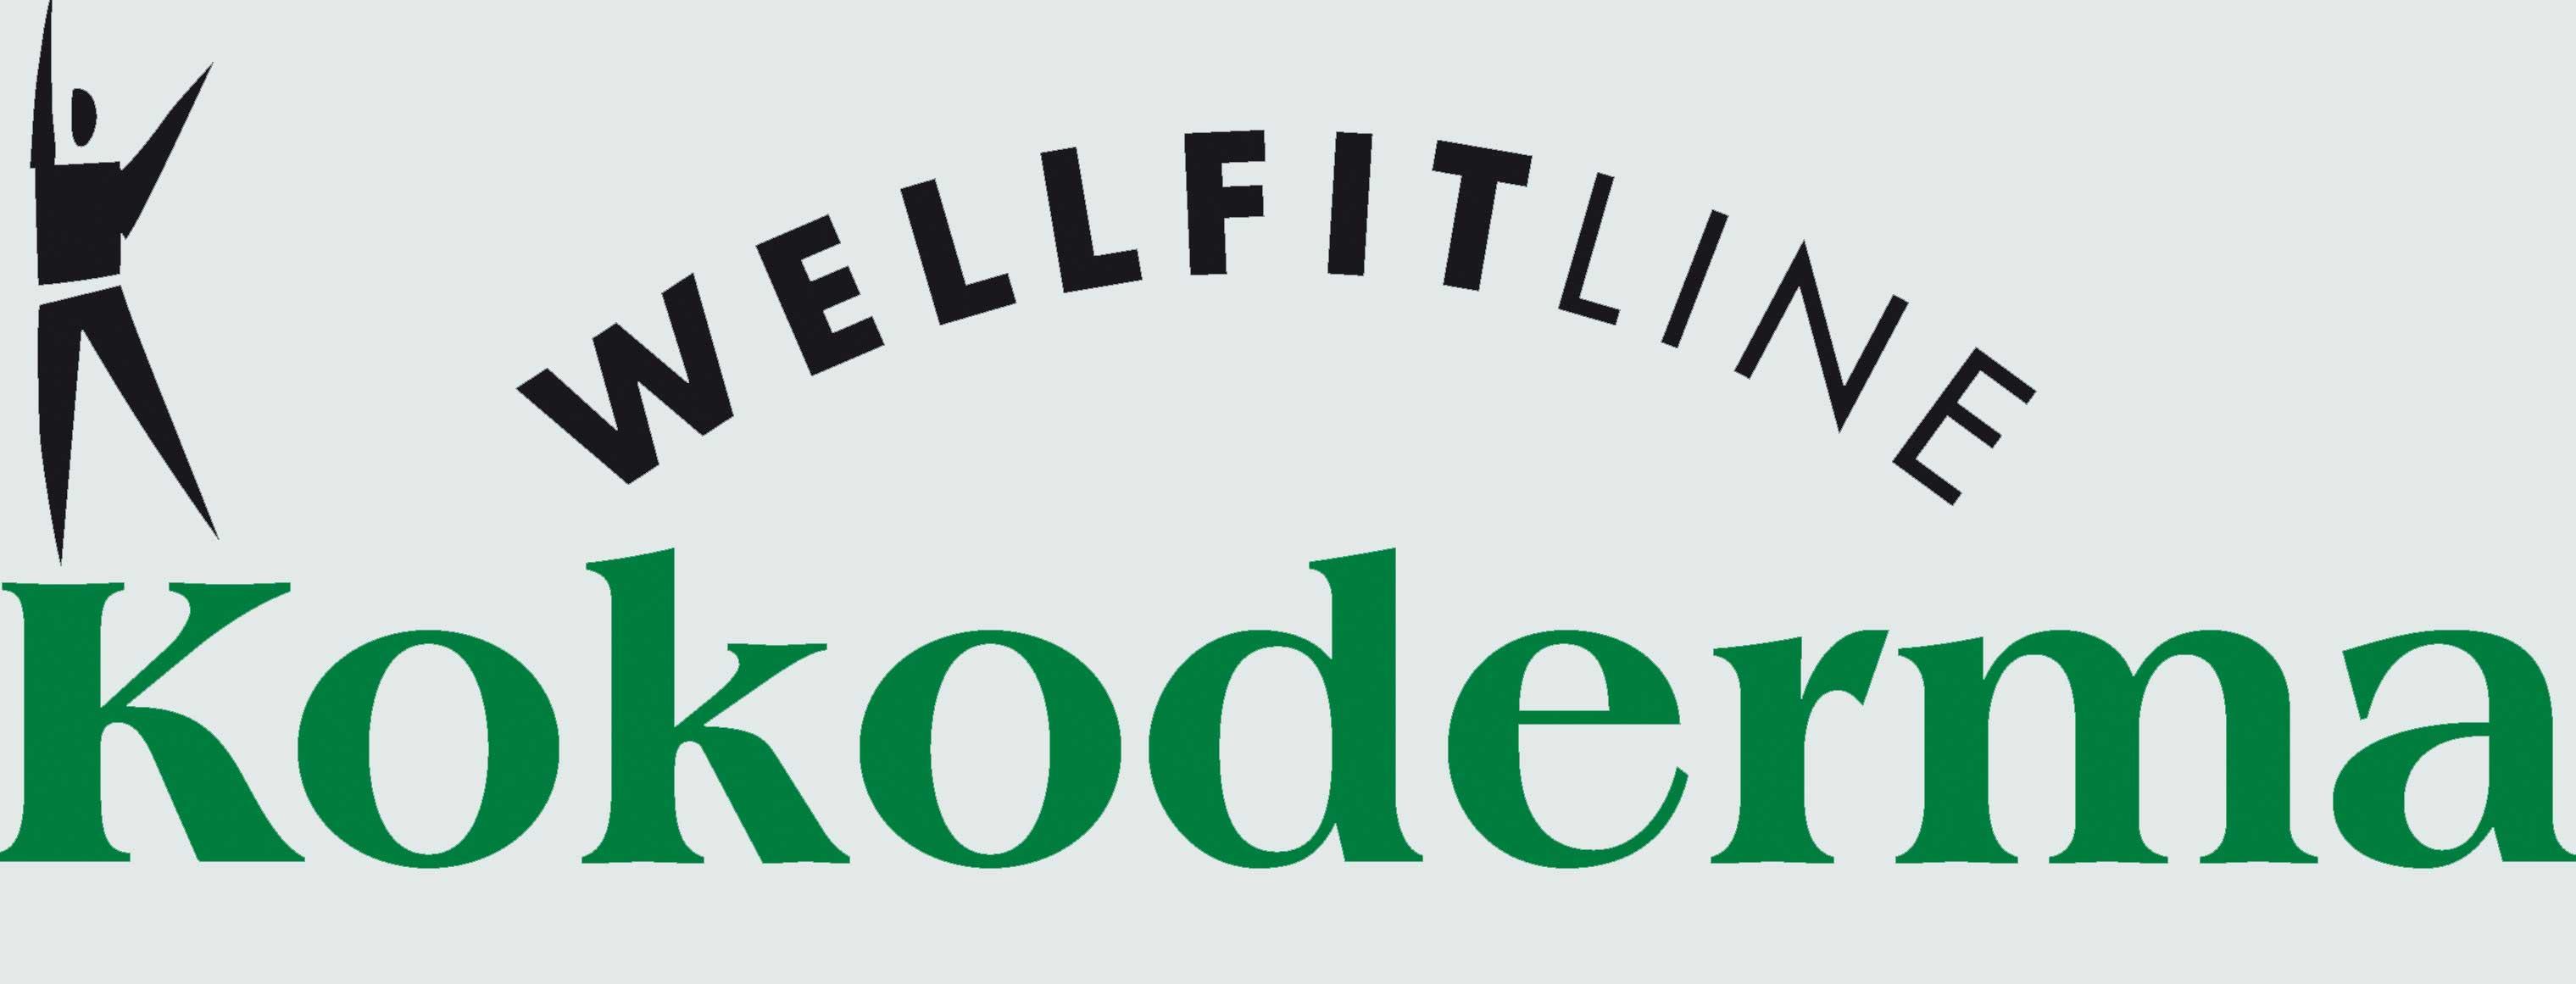 Kokoderma Cosmetics - Wellness Kosmetik aus eigener Schwarzwald Produktion